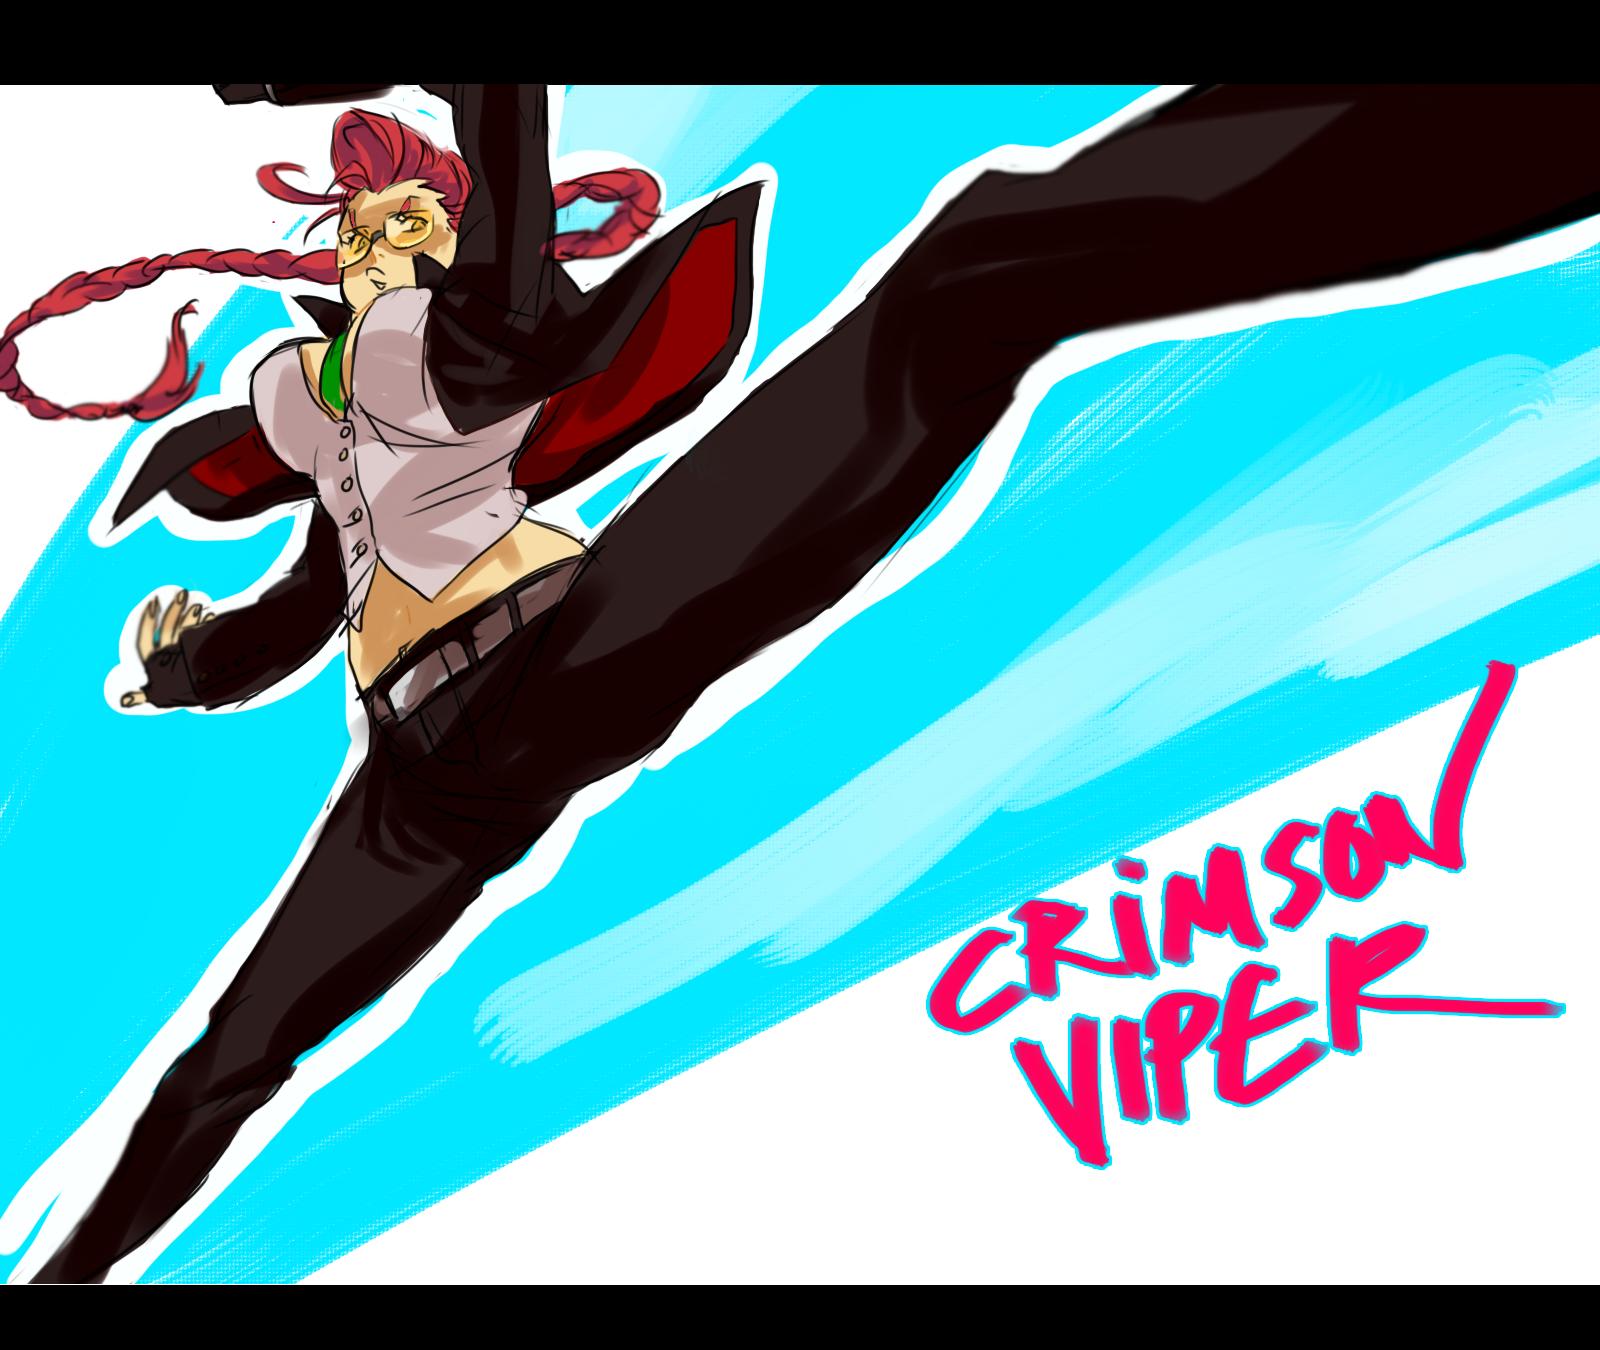 C VIPER by spacedrunk